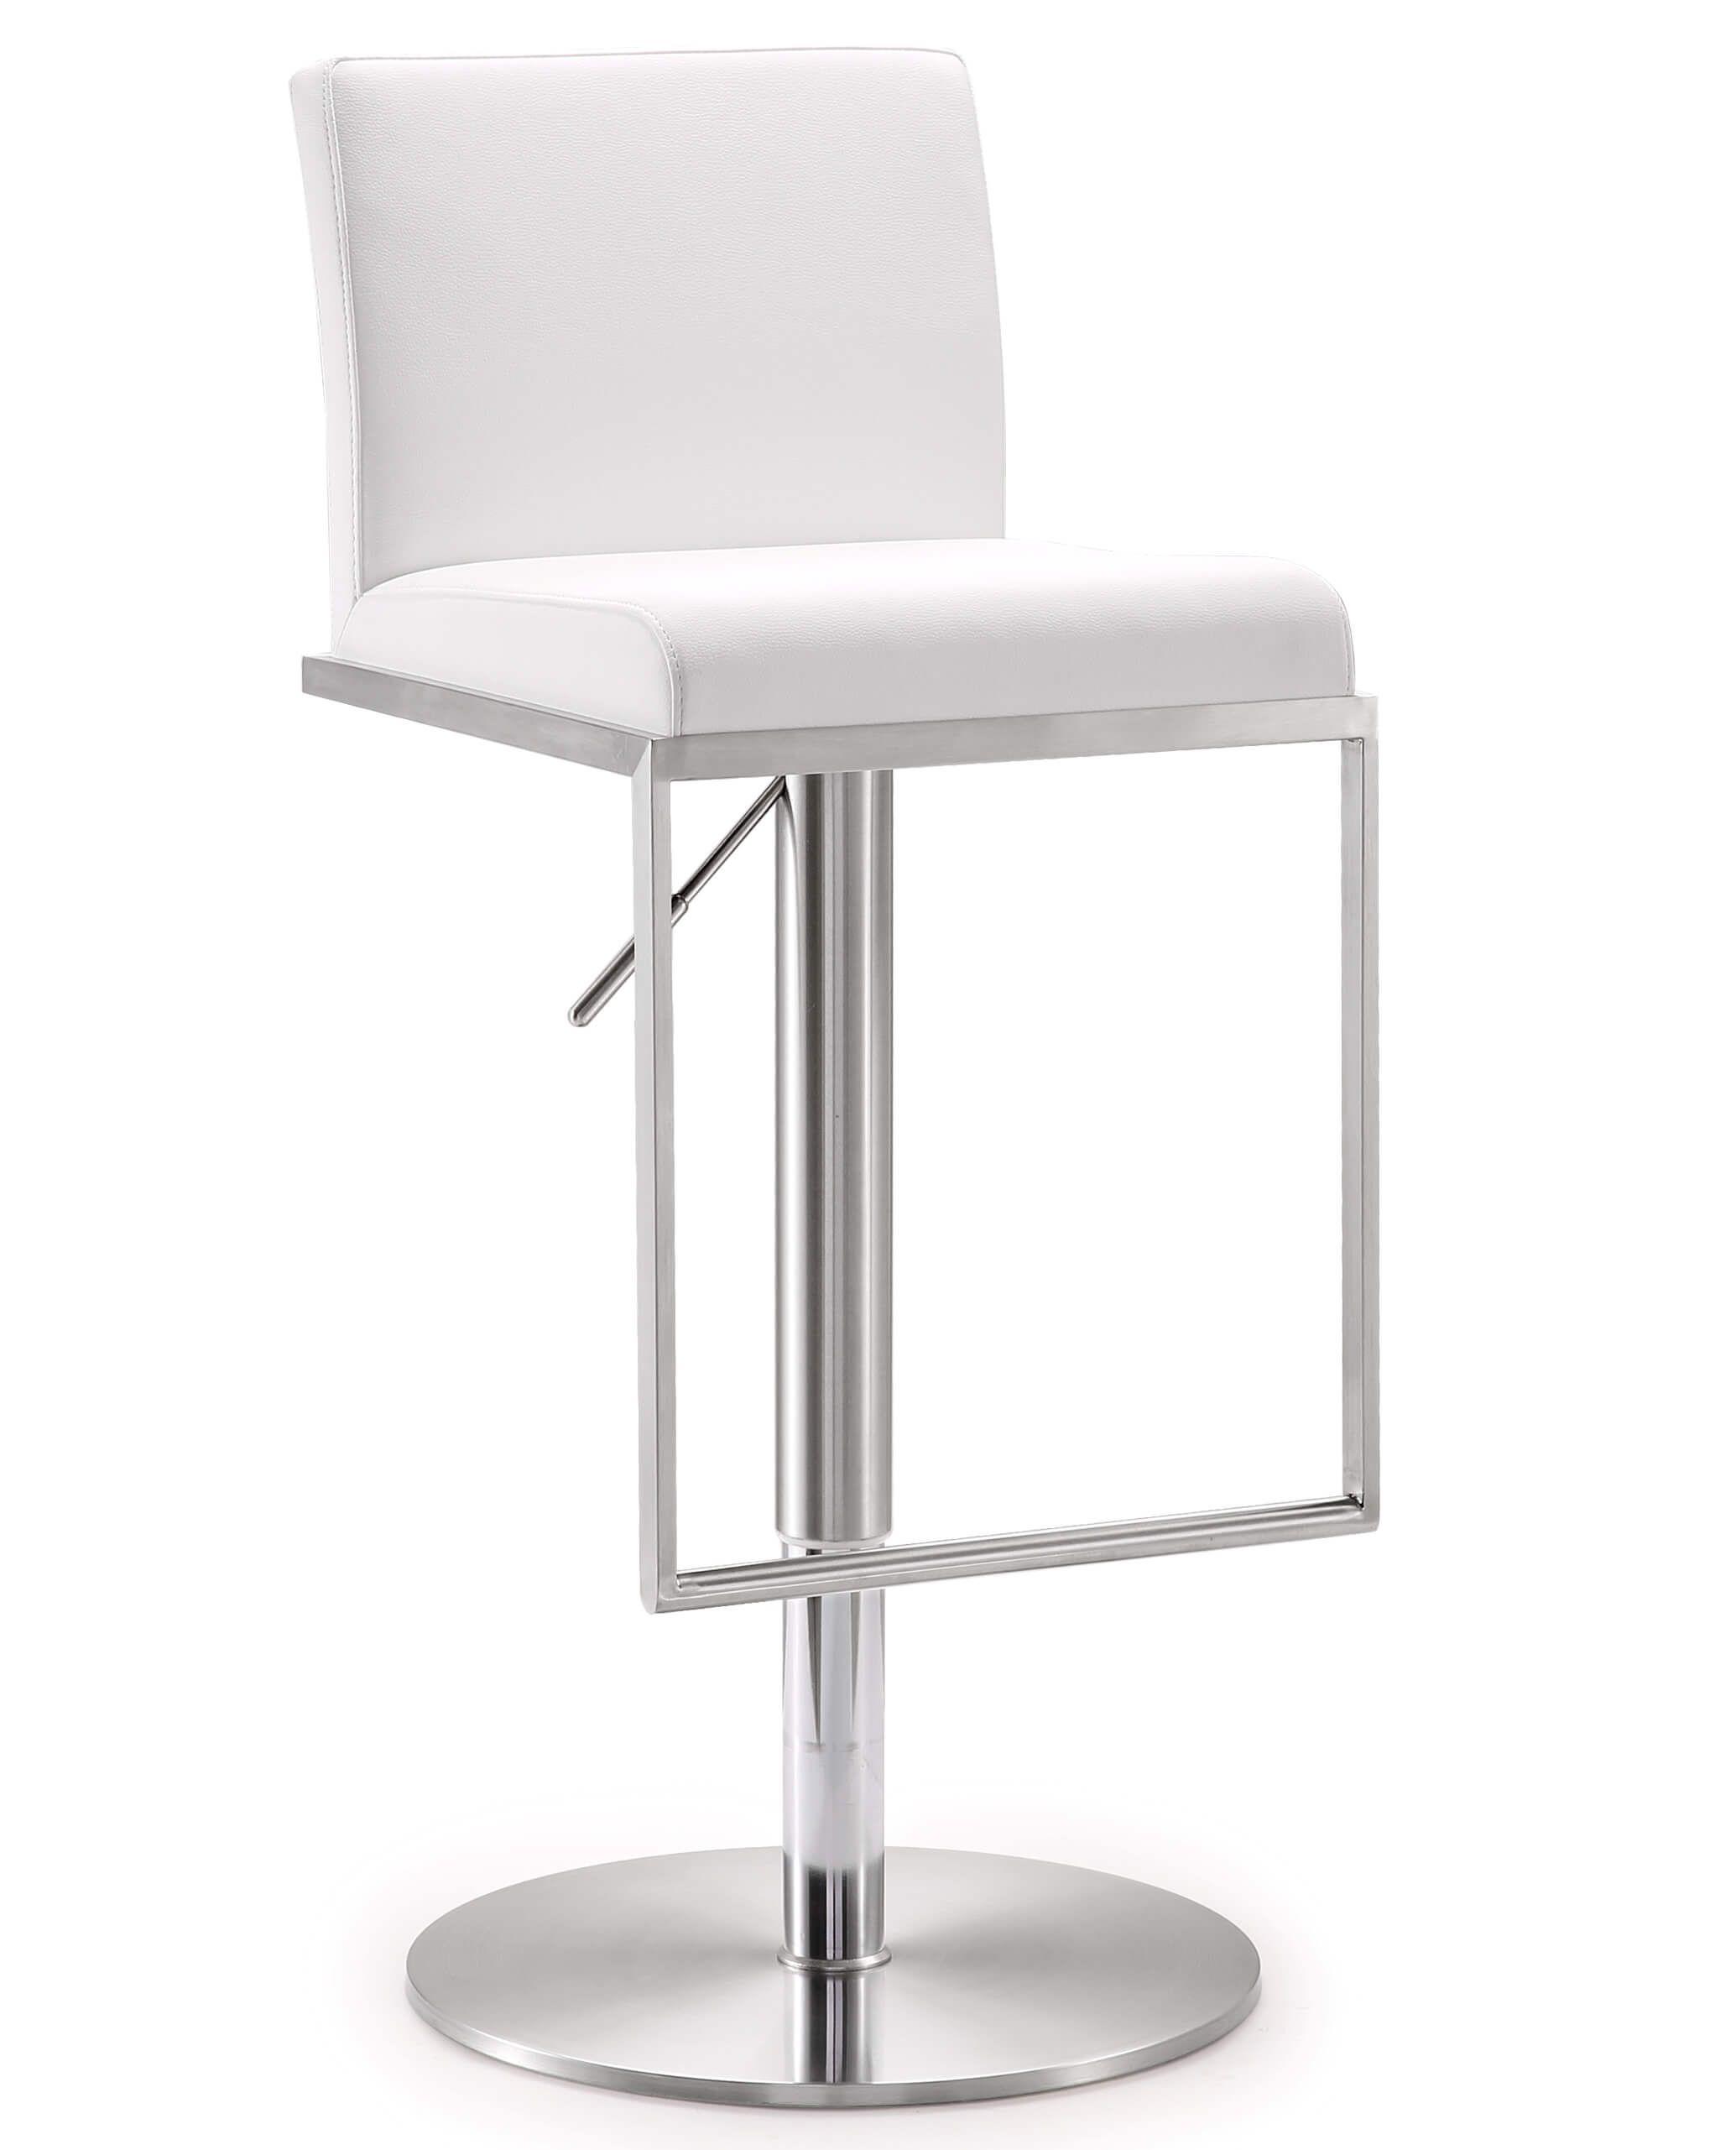 Amalfi White Stainless Steel Barstool Tov Furniture In 2021 Adjustable Bar Stools Modern Counter Stools Bar Stools